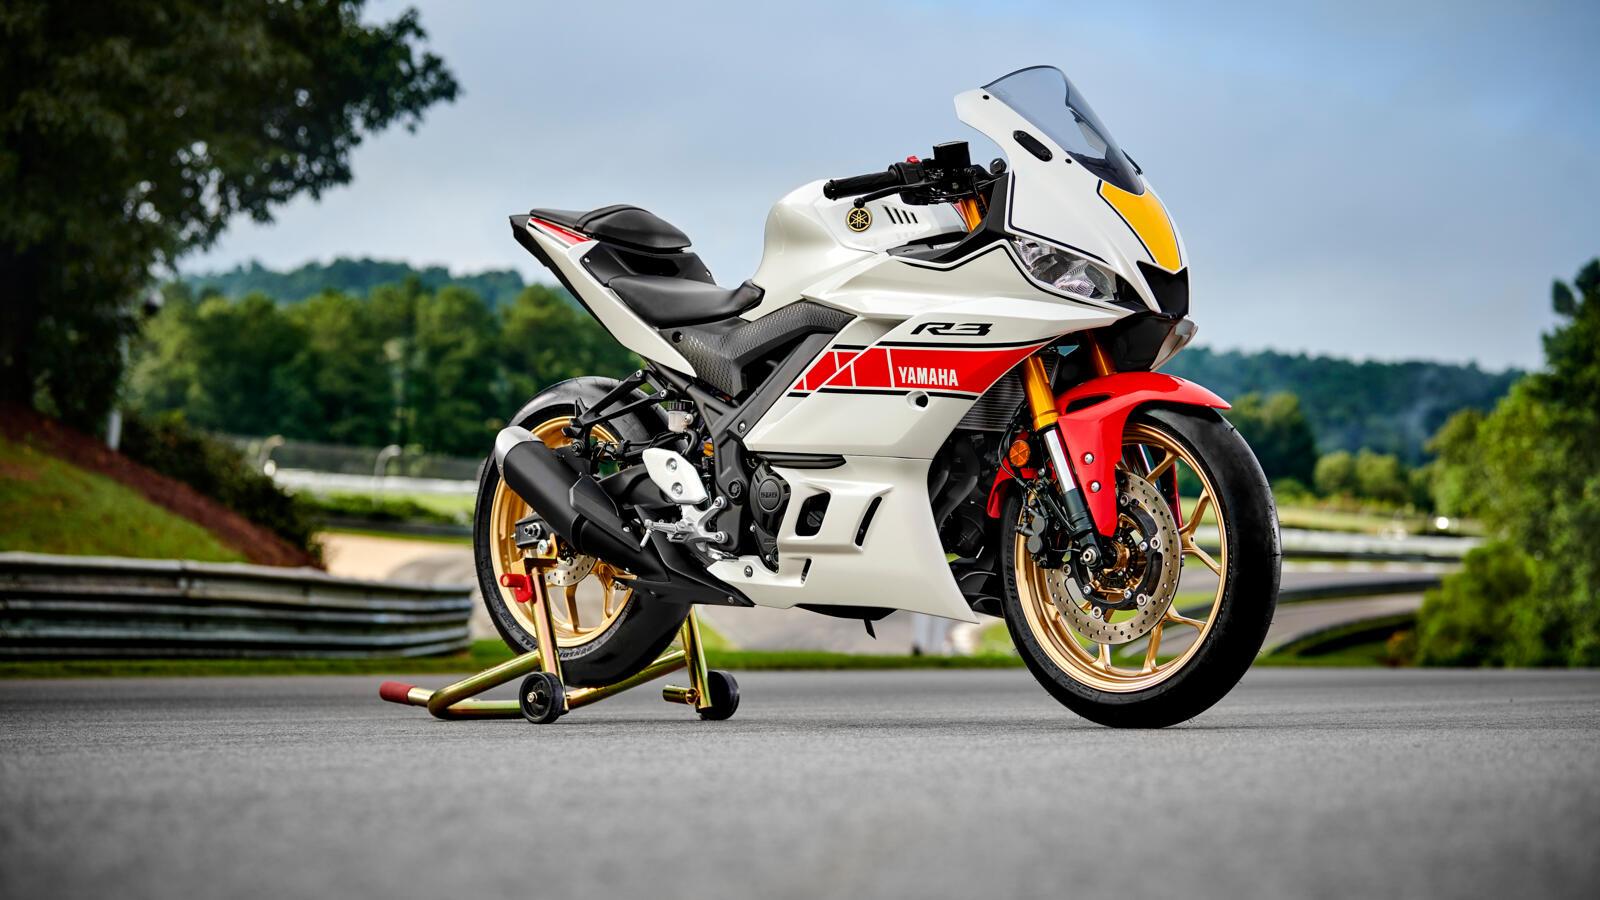 Die Yamaha R3 im World GP 60th Anniversary Design